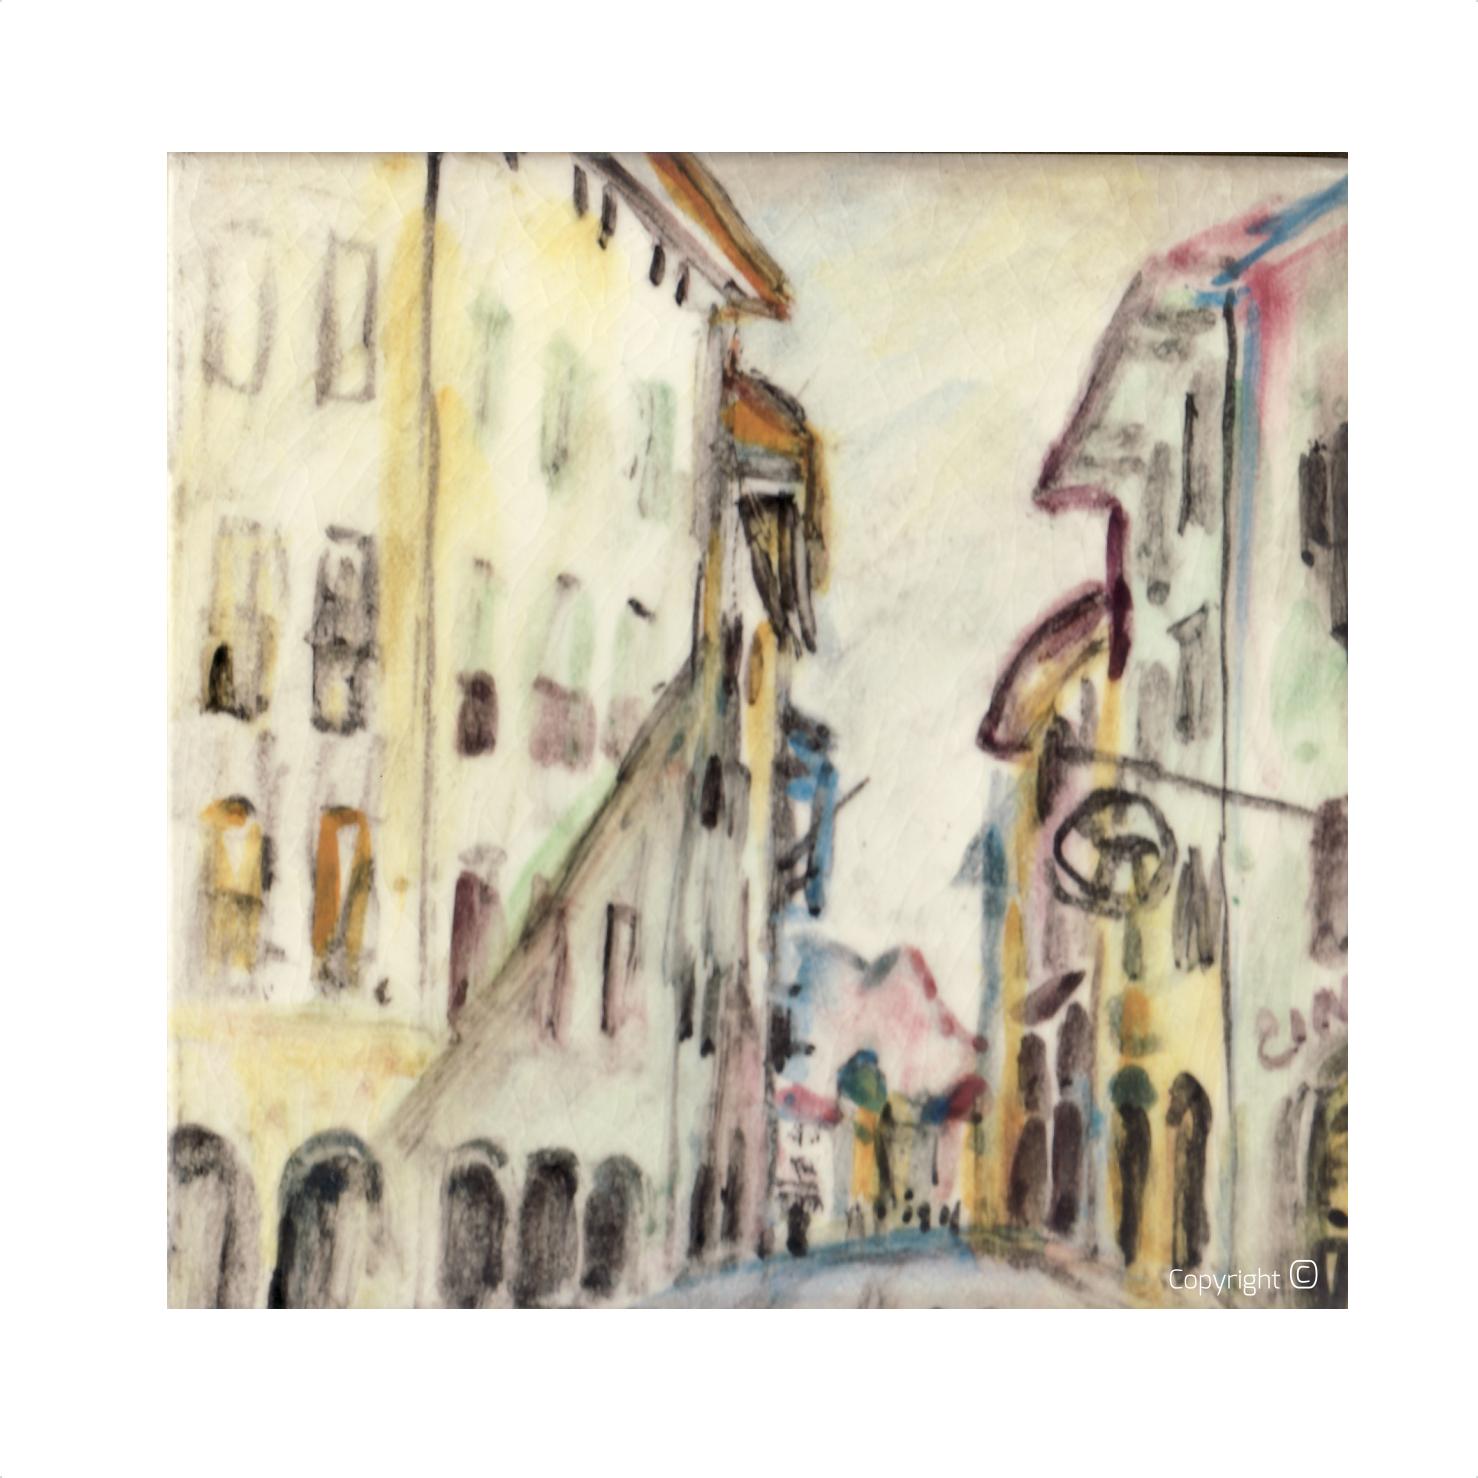 Street address in Bellinzona, 1963